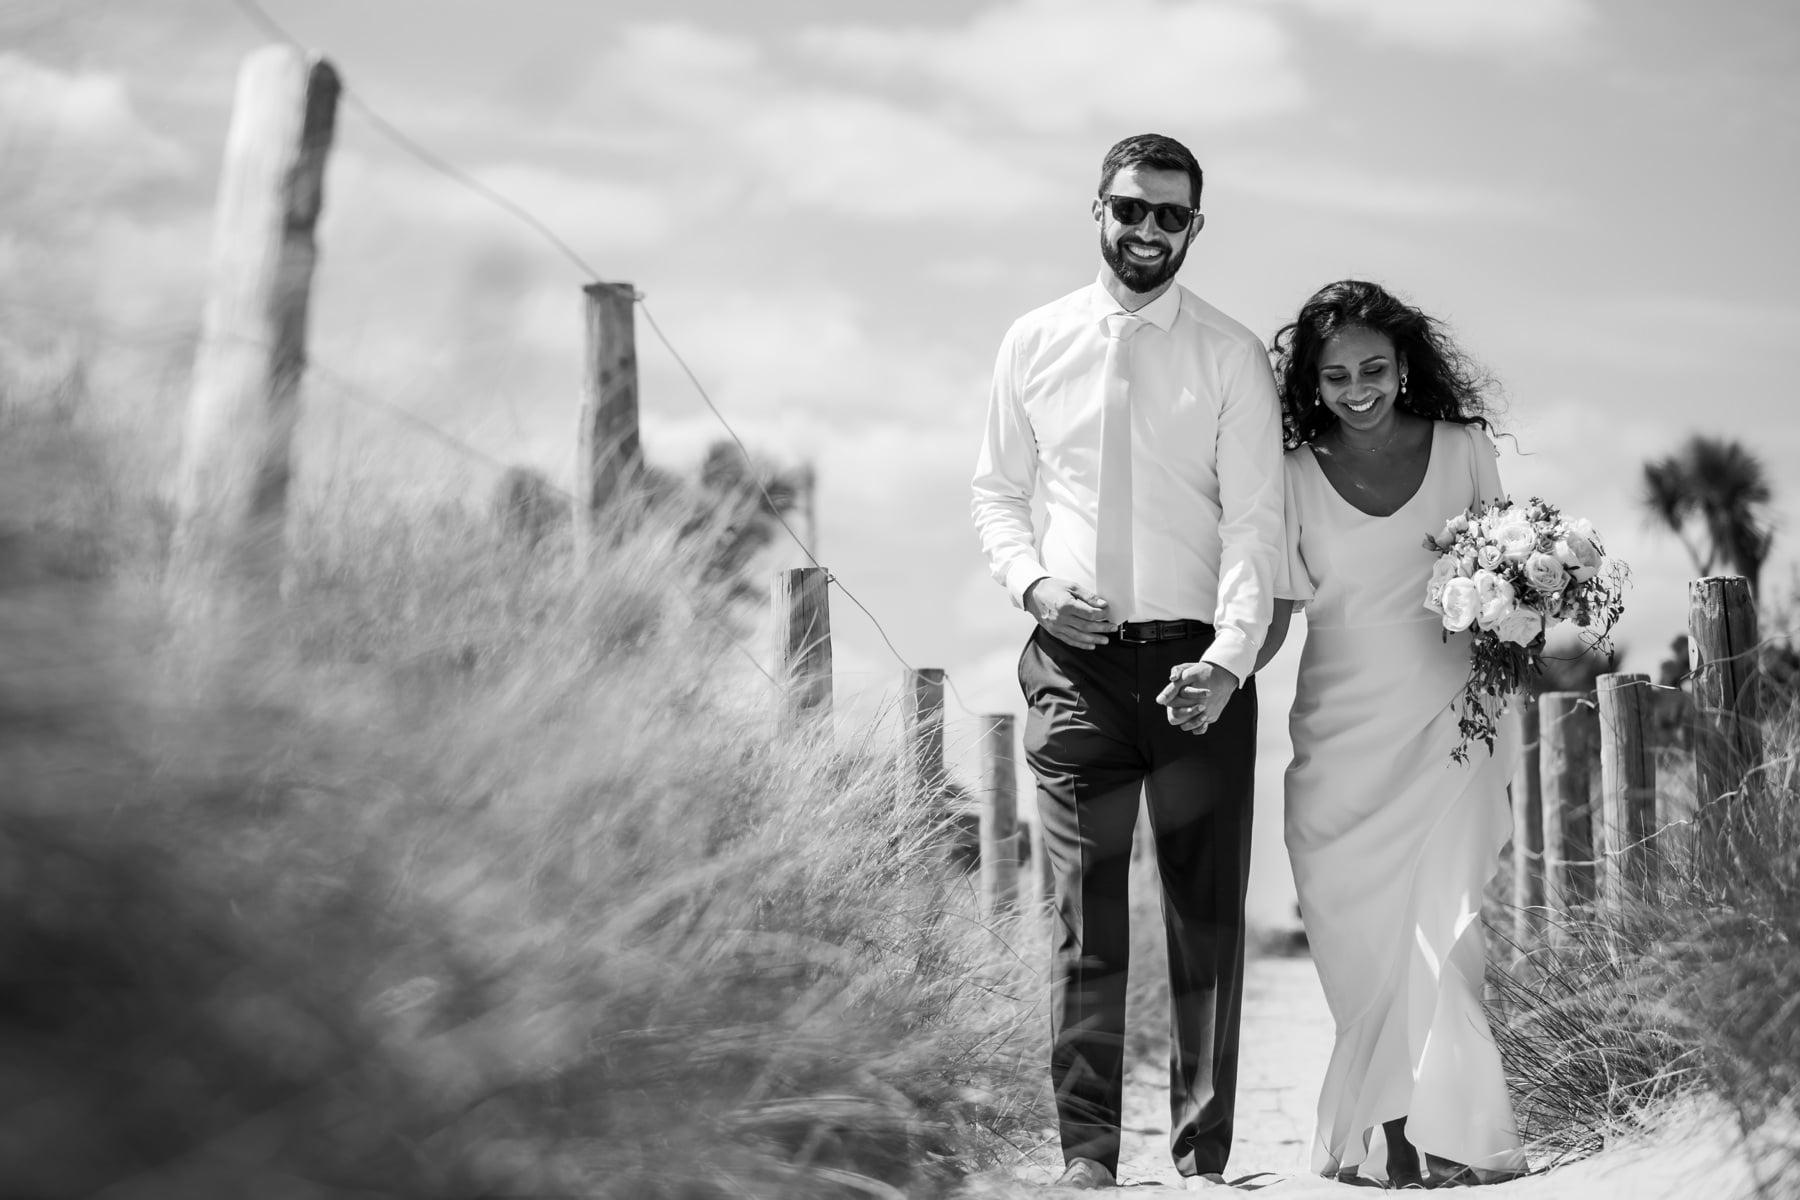 Sandbanks wedding photoshoot